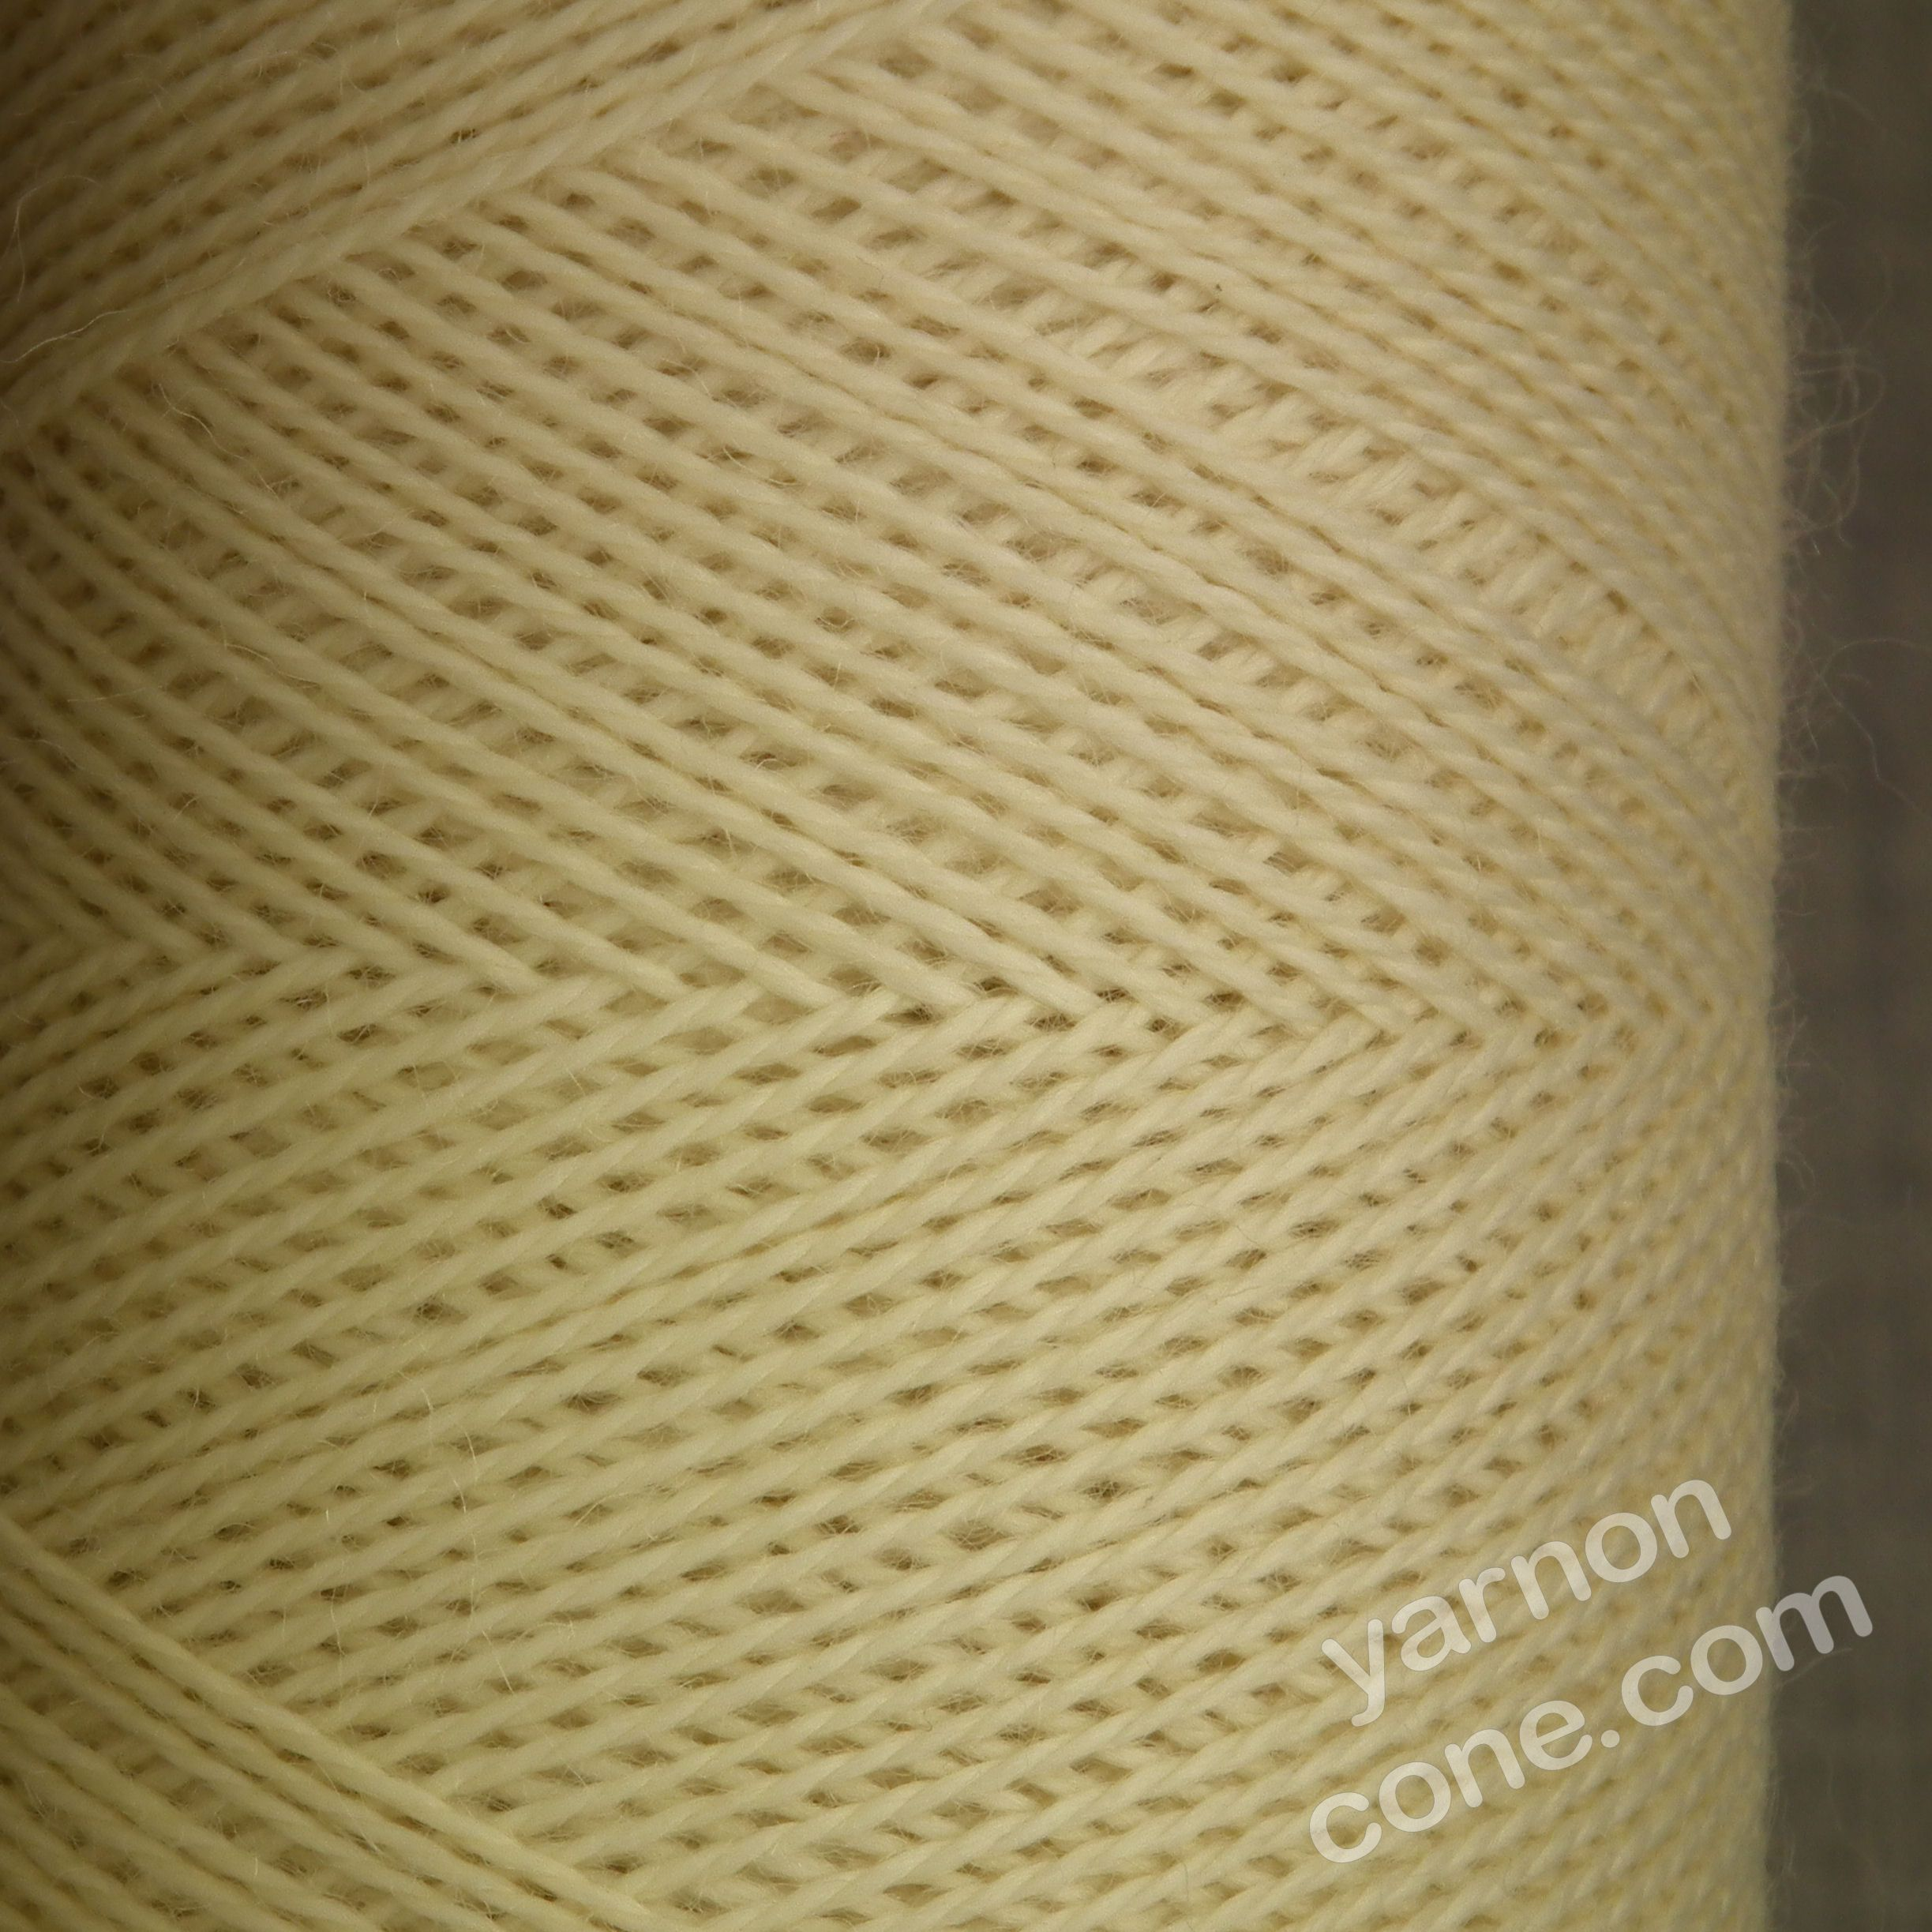 Jura weaving wool 4 ply yarn cone ecru cream undyed natural